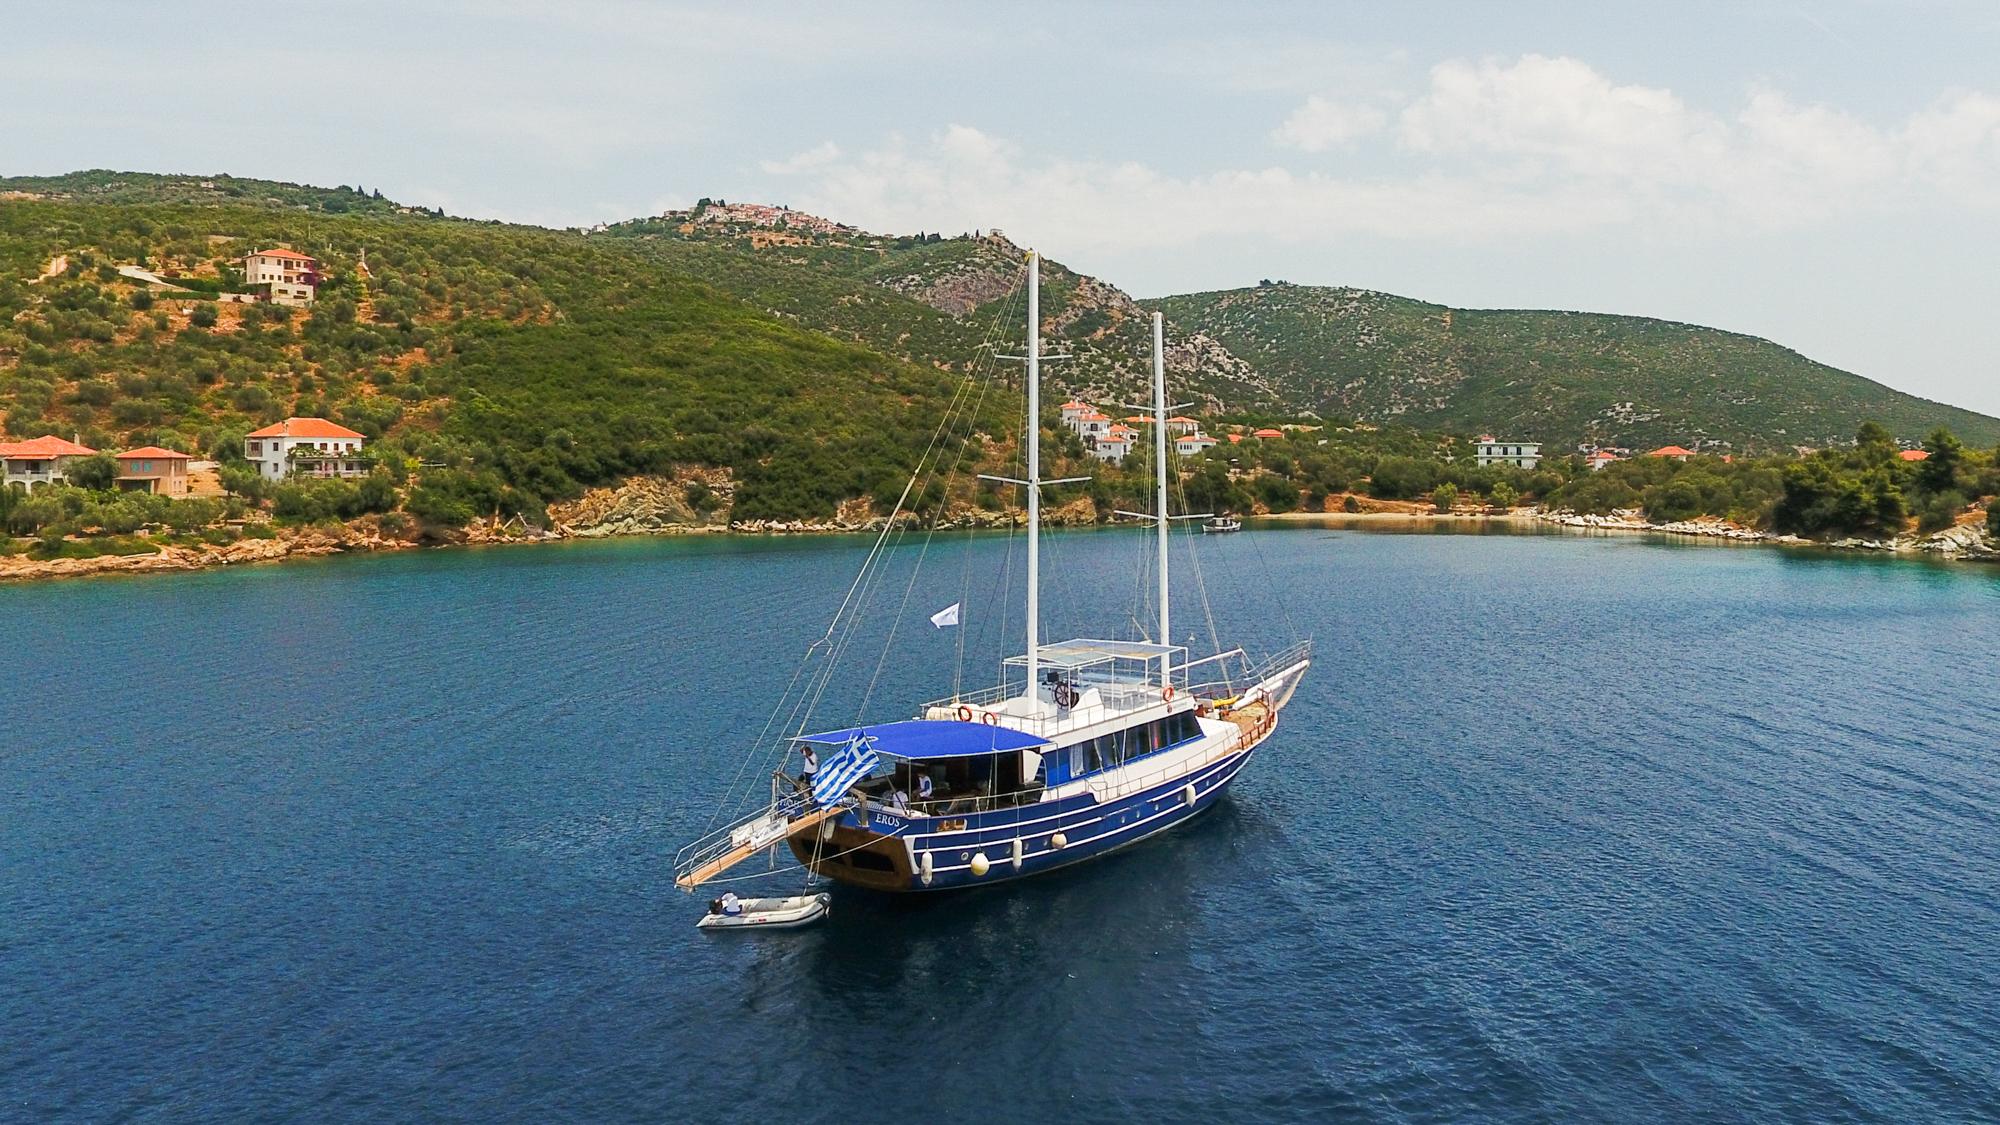 Luxury Traditional Motor Sailer (Gulet) 108 Feet